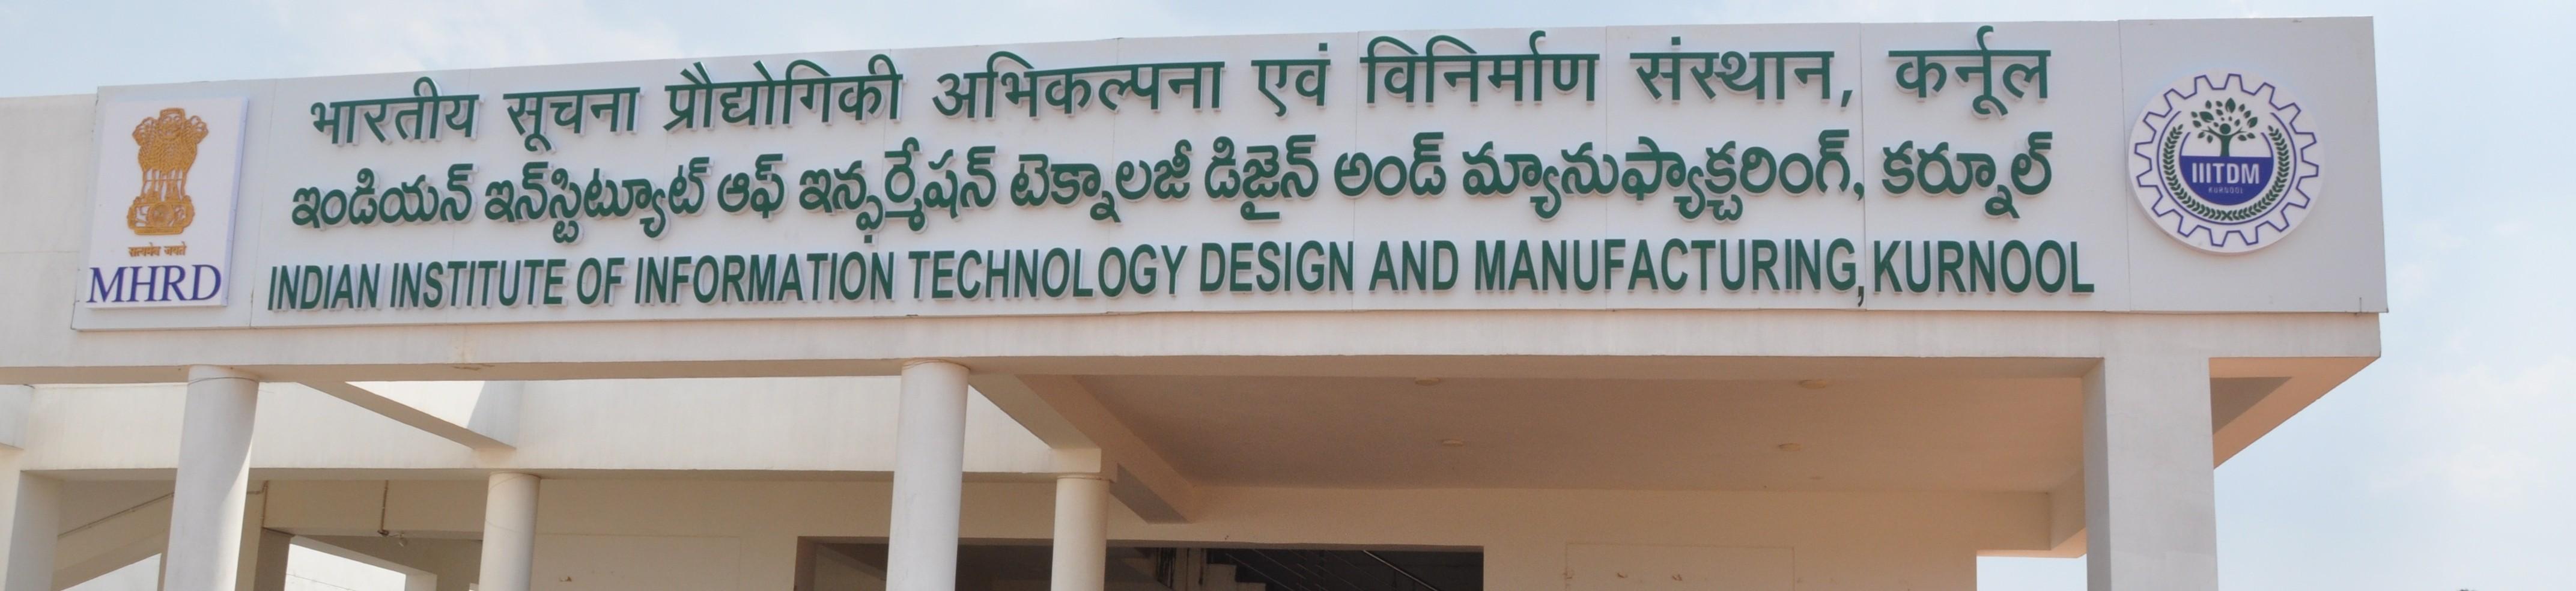 Indian Institute Of Information Technology Design Manufacturing Kurnool Linkedin